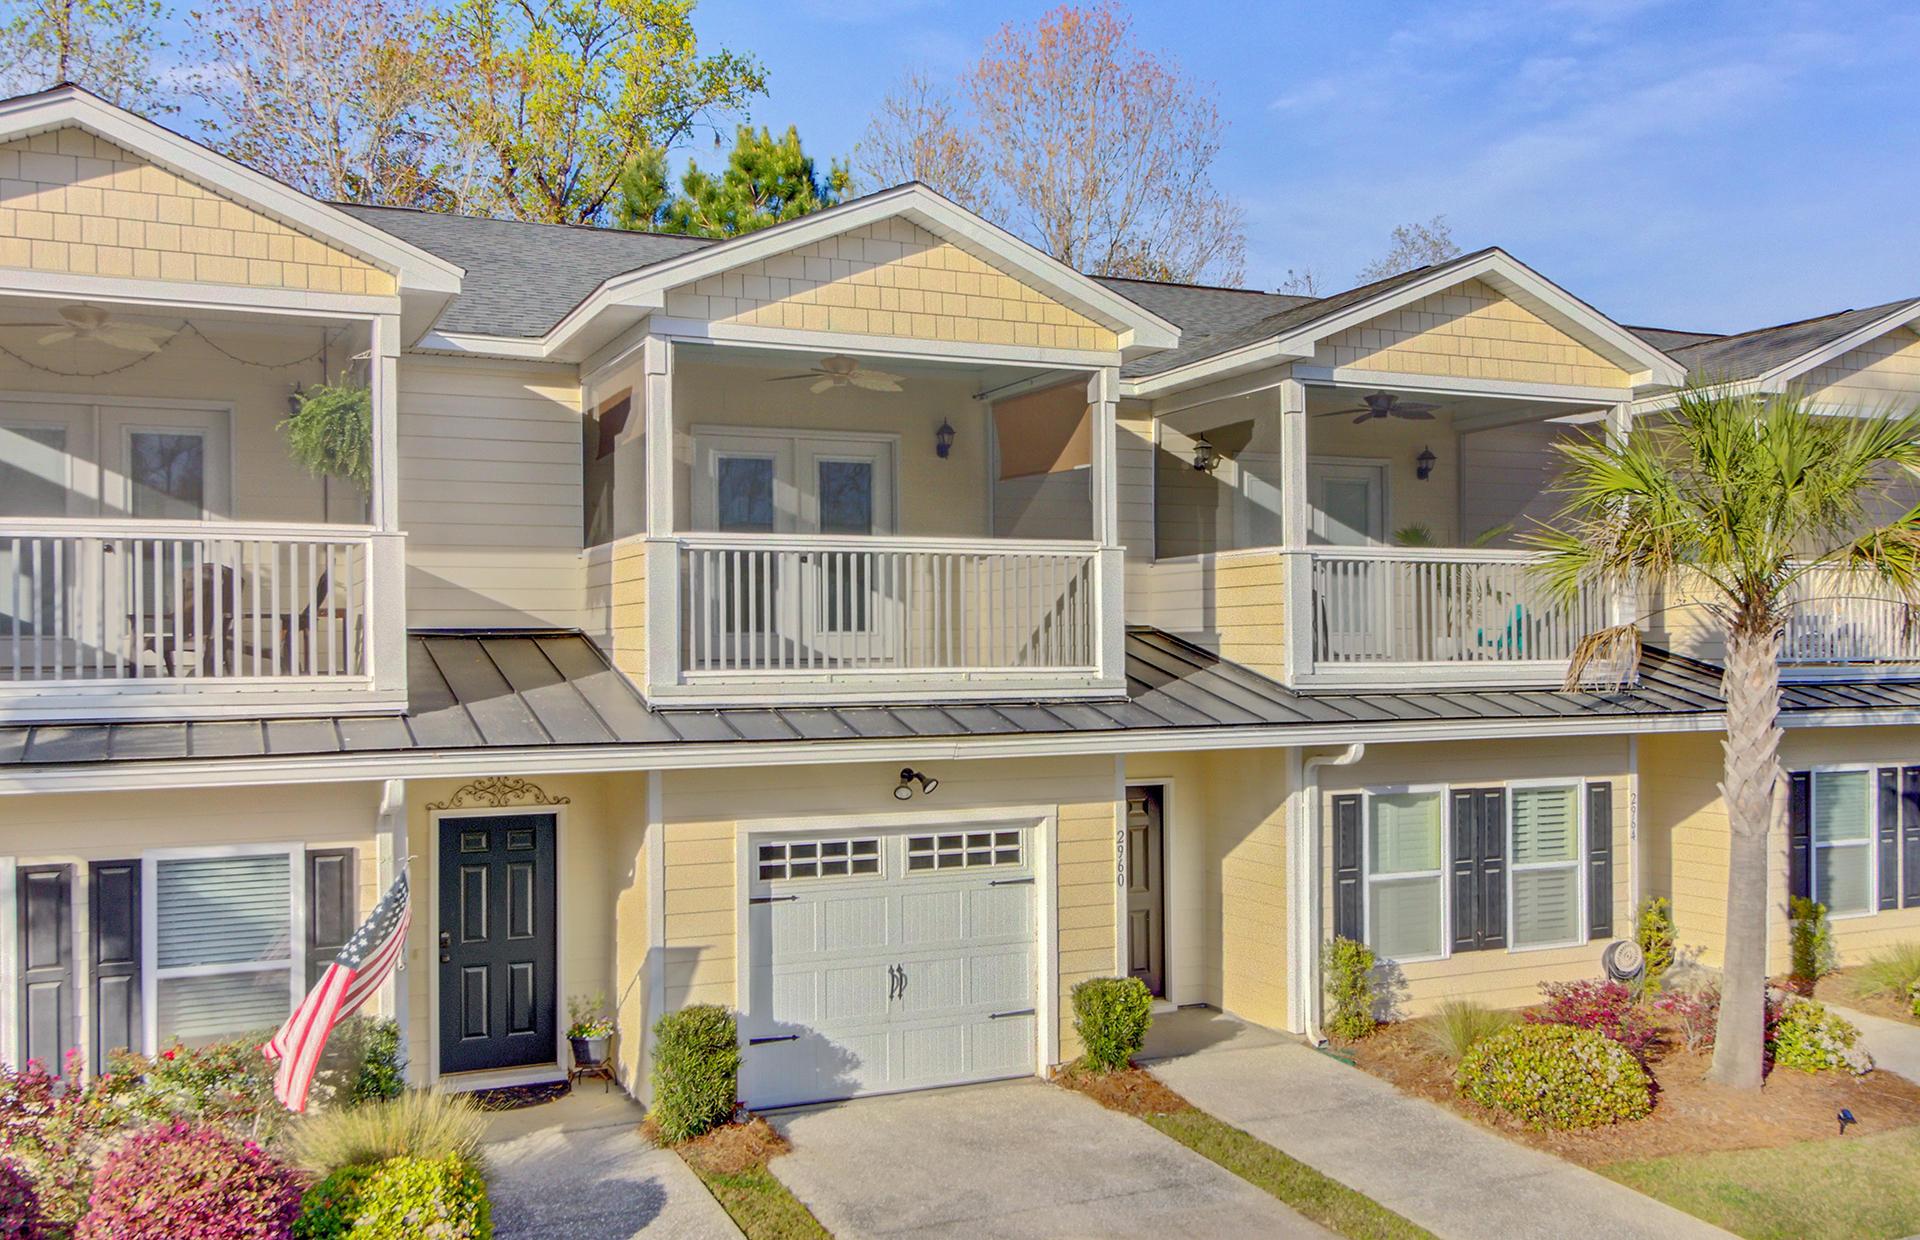 Carol Oaks Town Homes Homes For Sale - 2960 Emma, Mount Pleasant, SC - 24